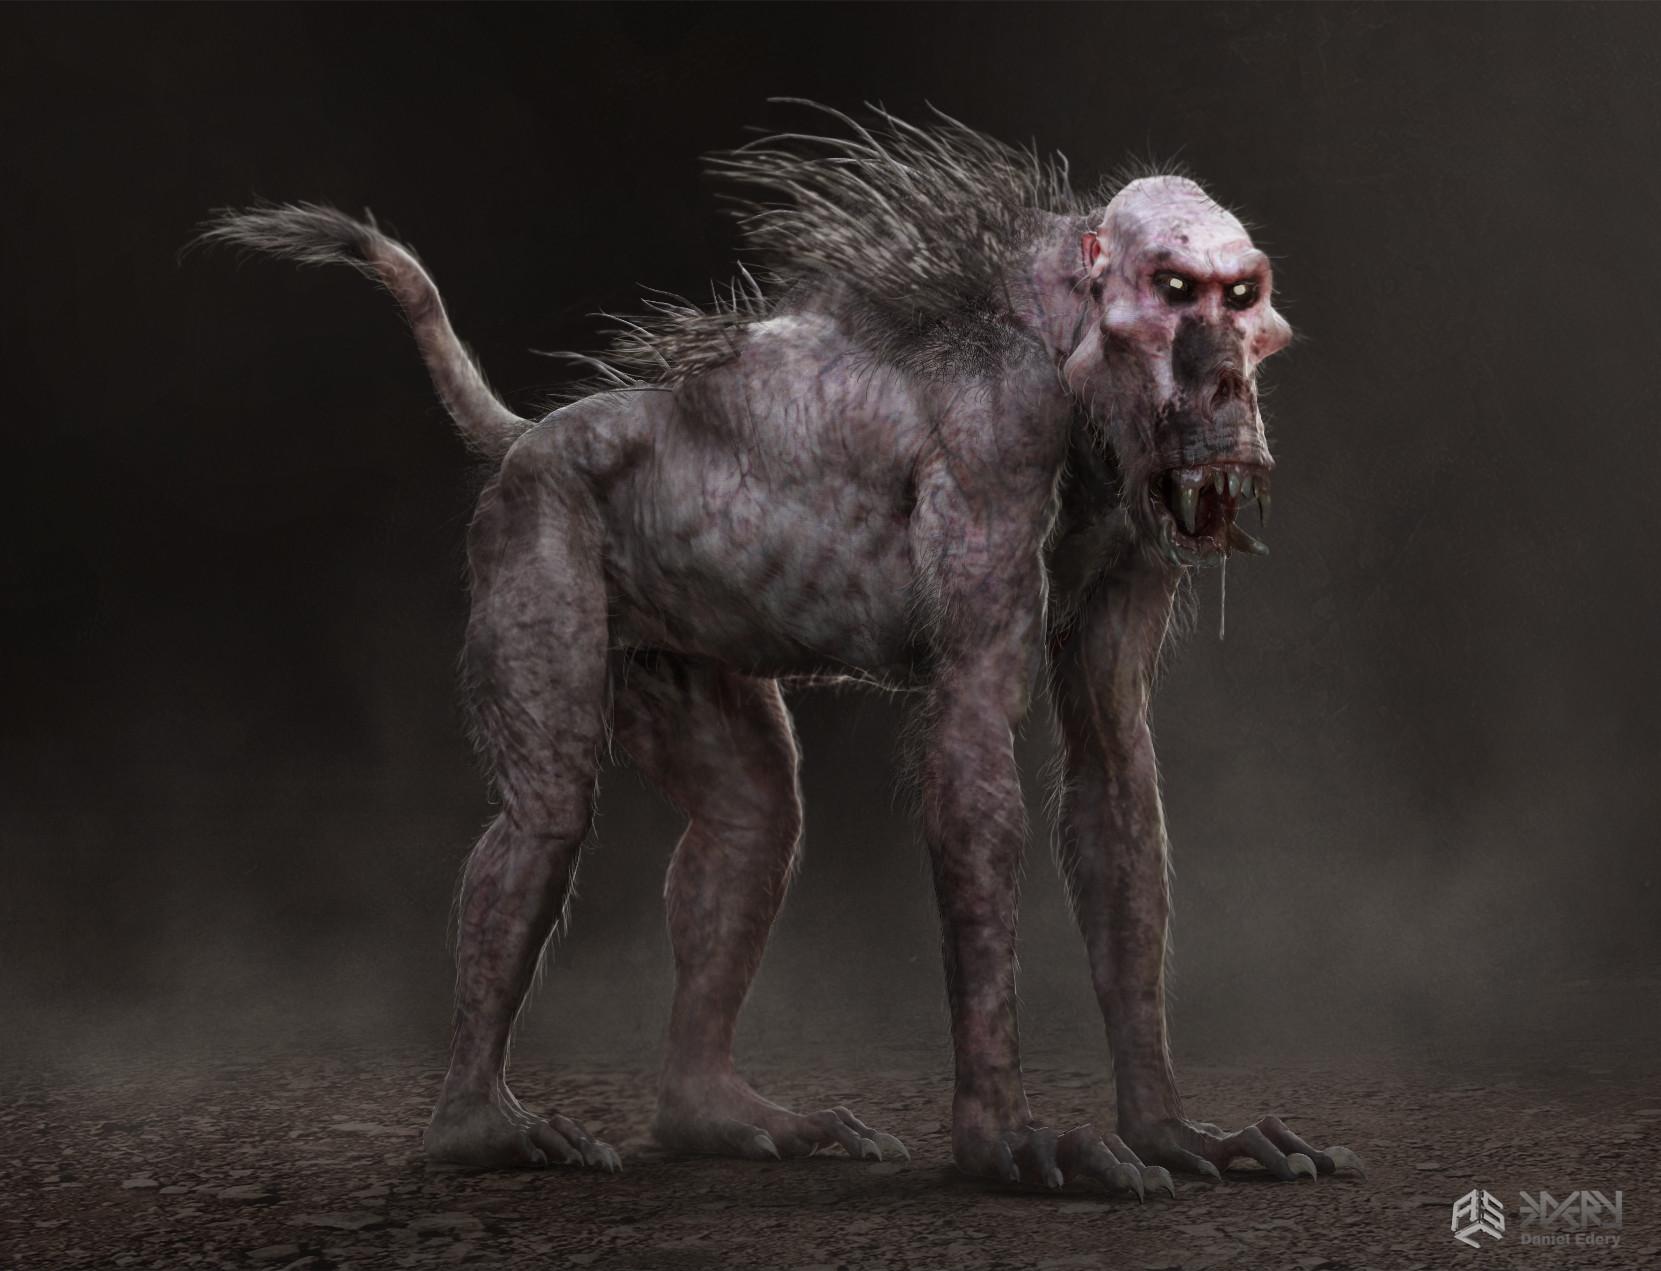 Daniel edery baboon v01 001